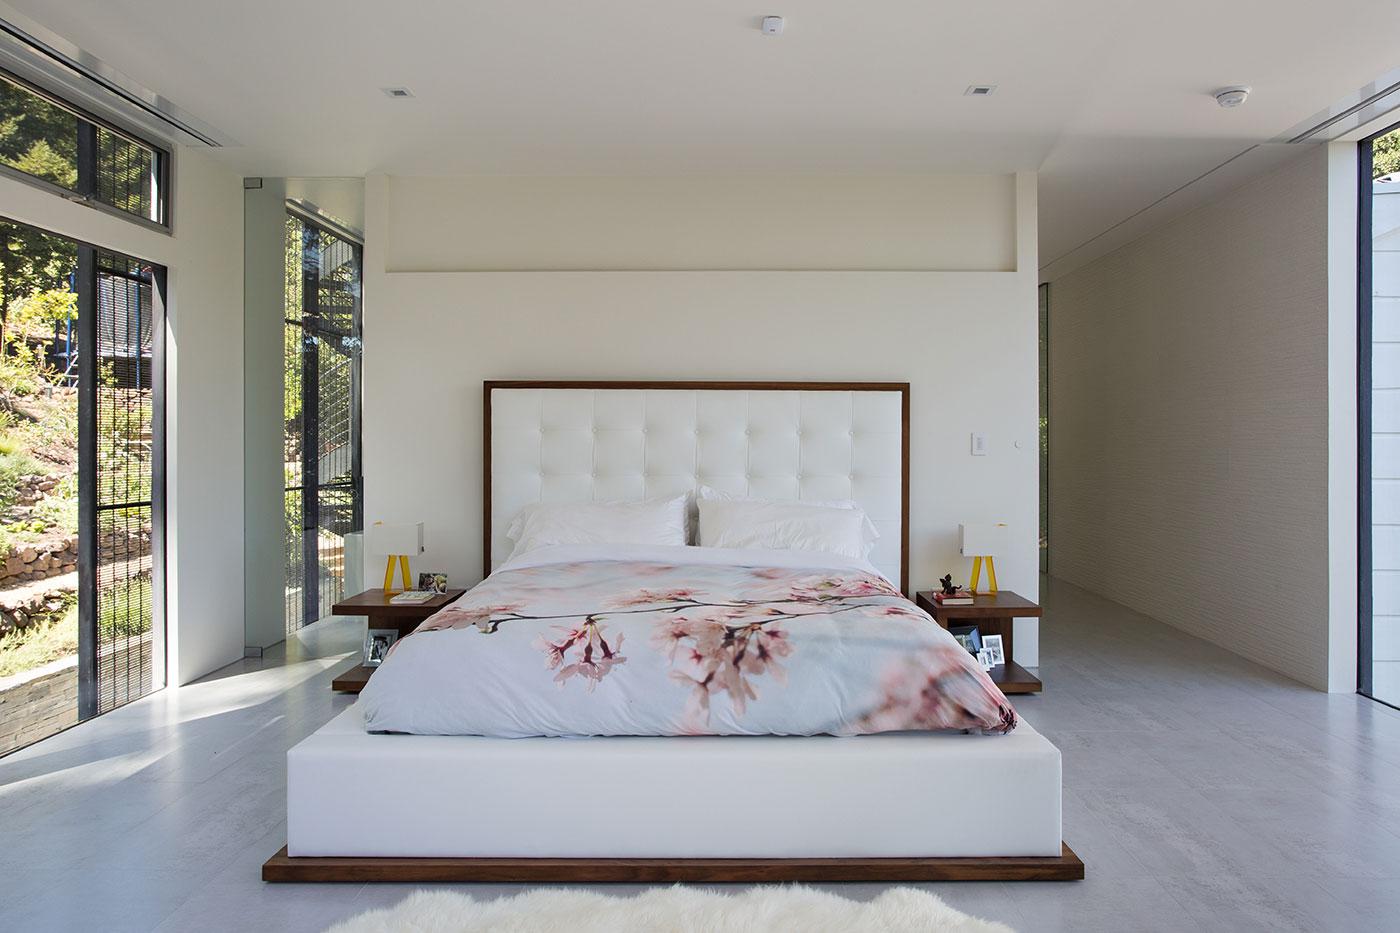 Minimal Modern Addition Home with Dark Grey Stuccoed Walls by Klopf Architecture-12